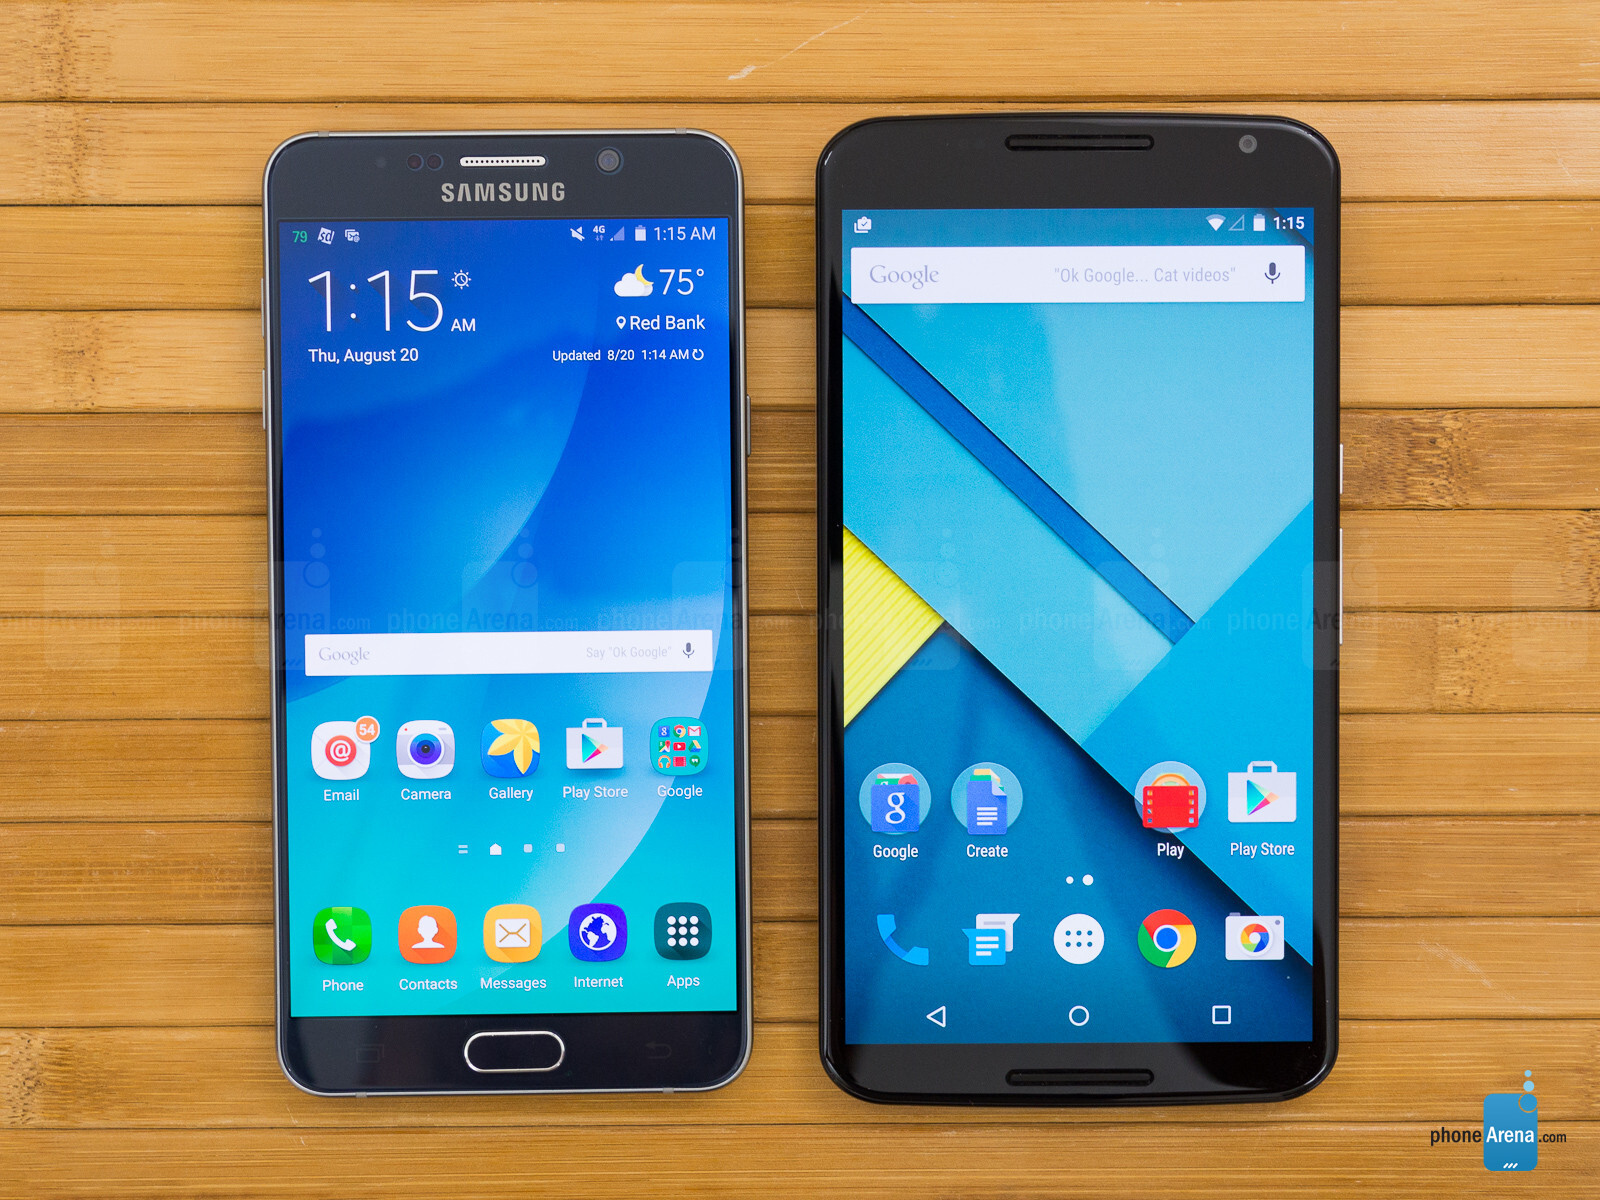 Samsung Galaxy Note5 vs Google Nexus 6 - PhoneArena